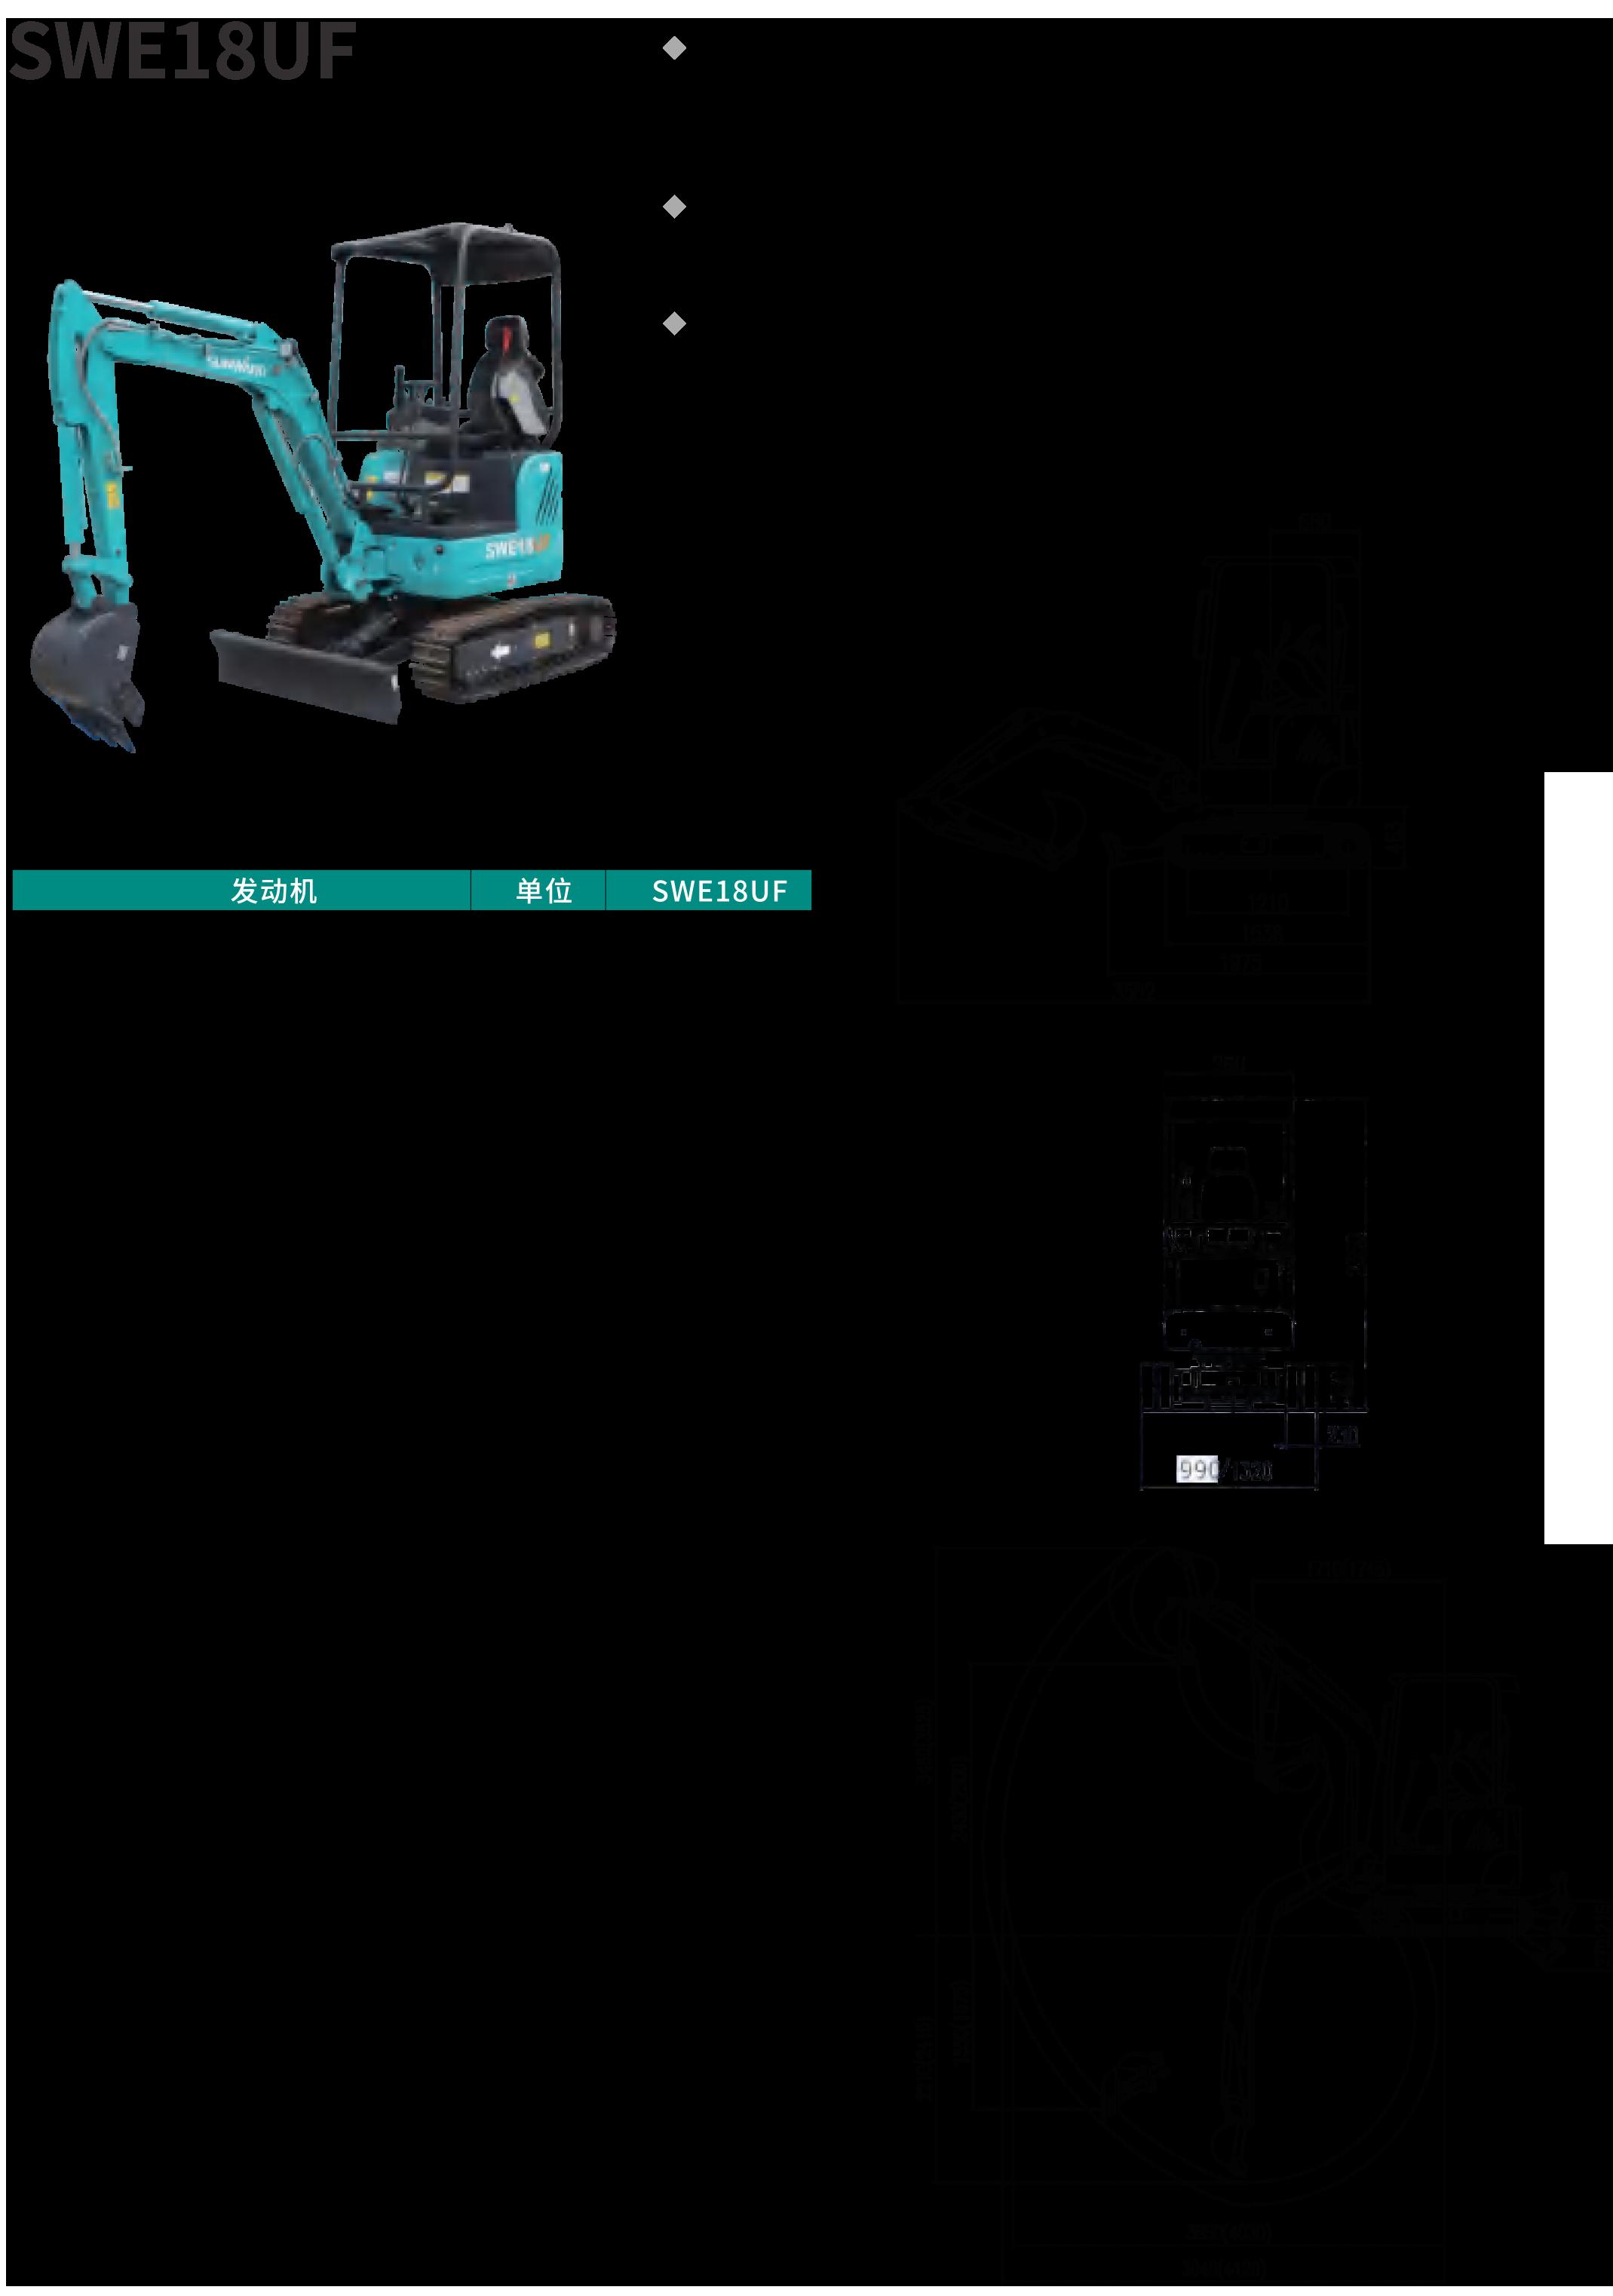 SWE18UF 微型挖掘机